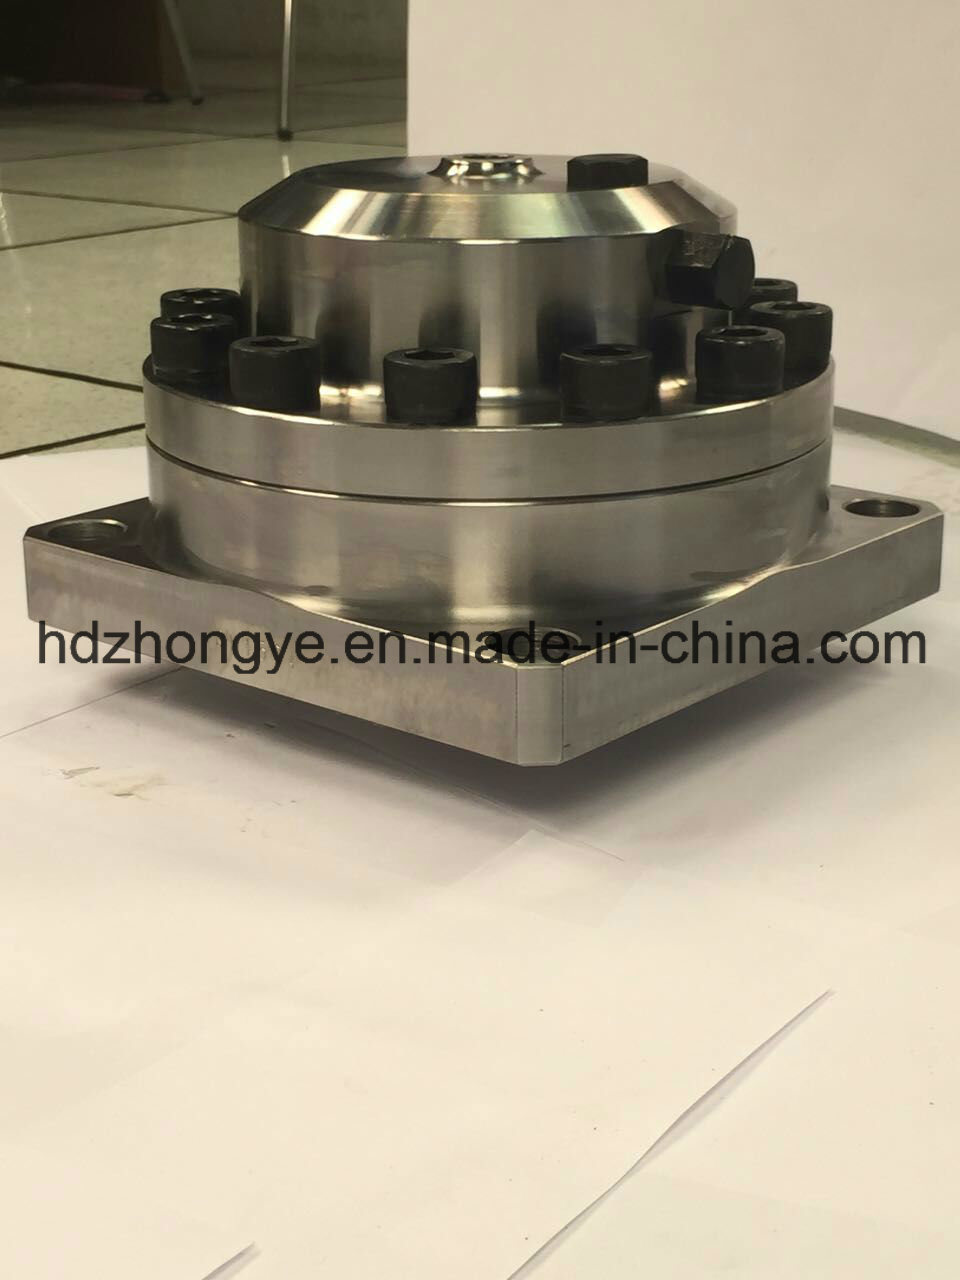 Hb 30g Accumulator for Hydraulic Breaker Parts